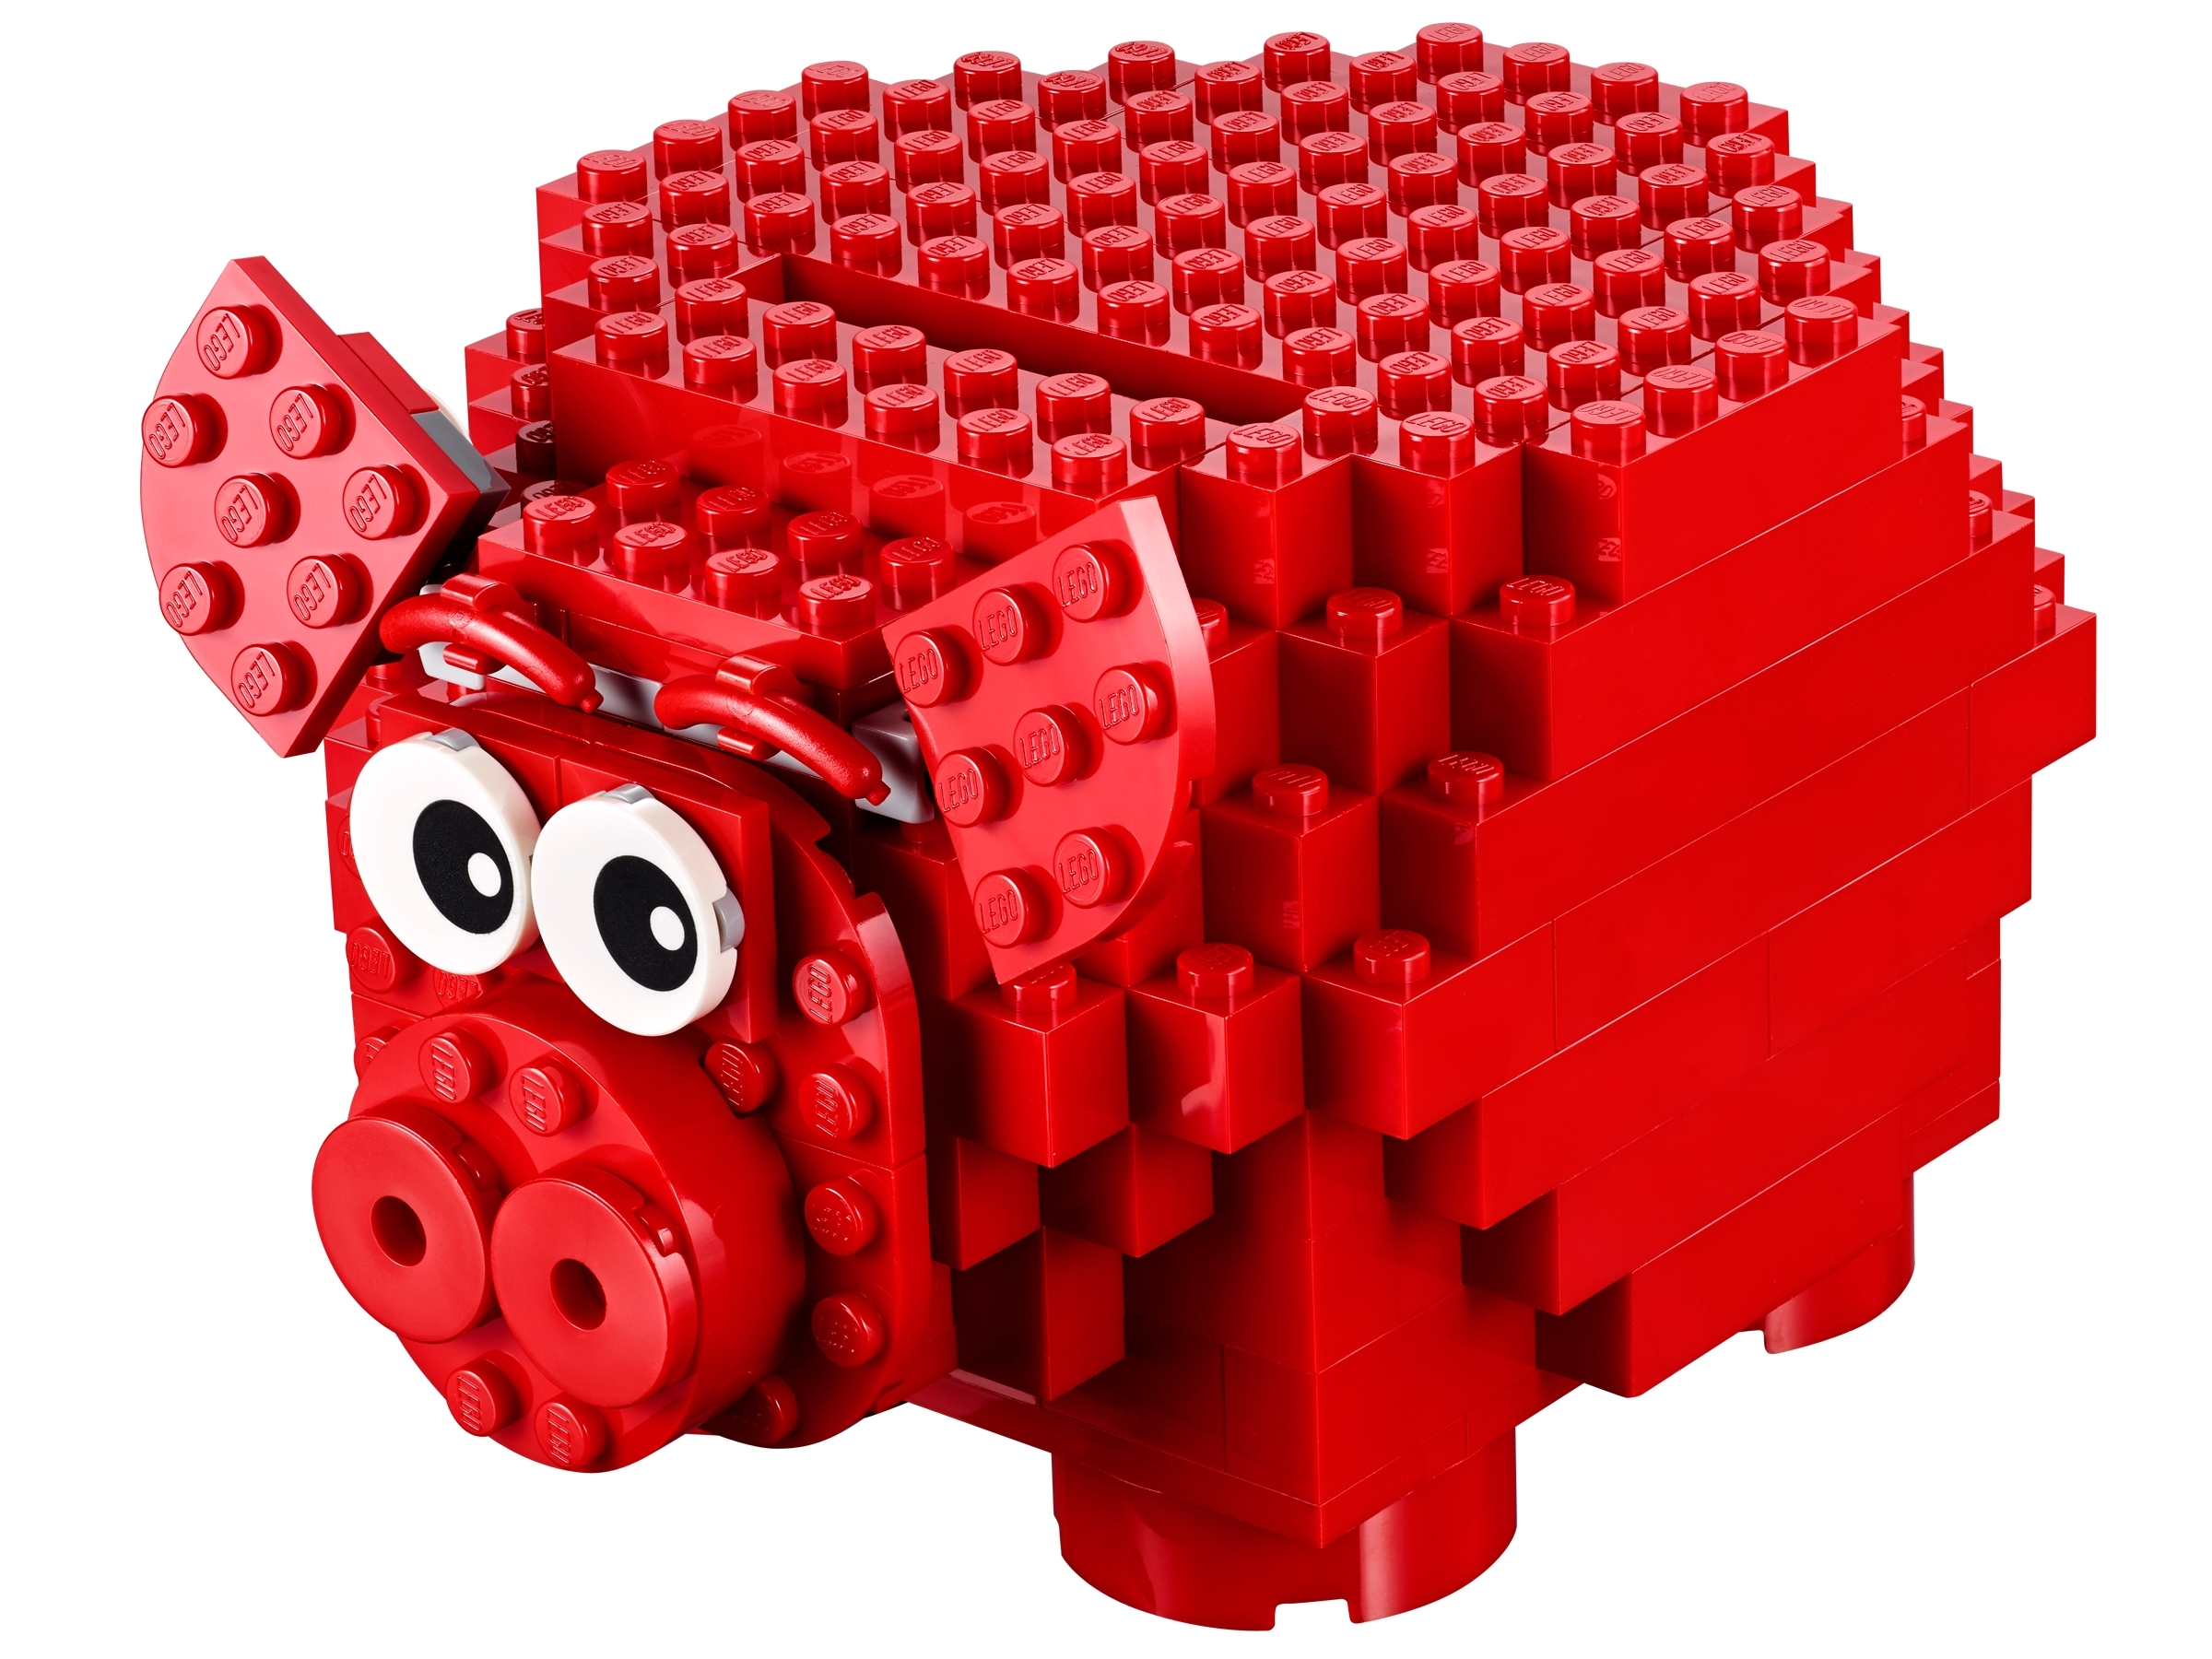 LEGO 40155 2015 Piggy Coin Bank RED